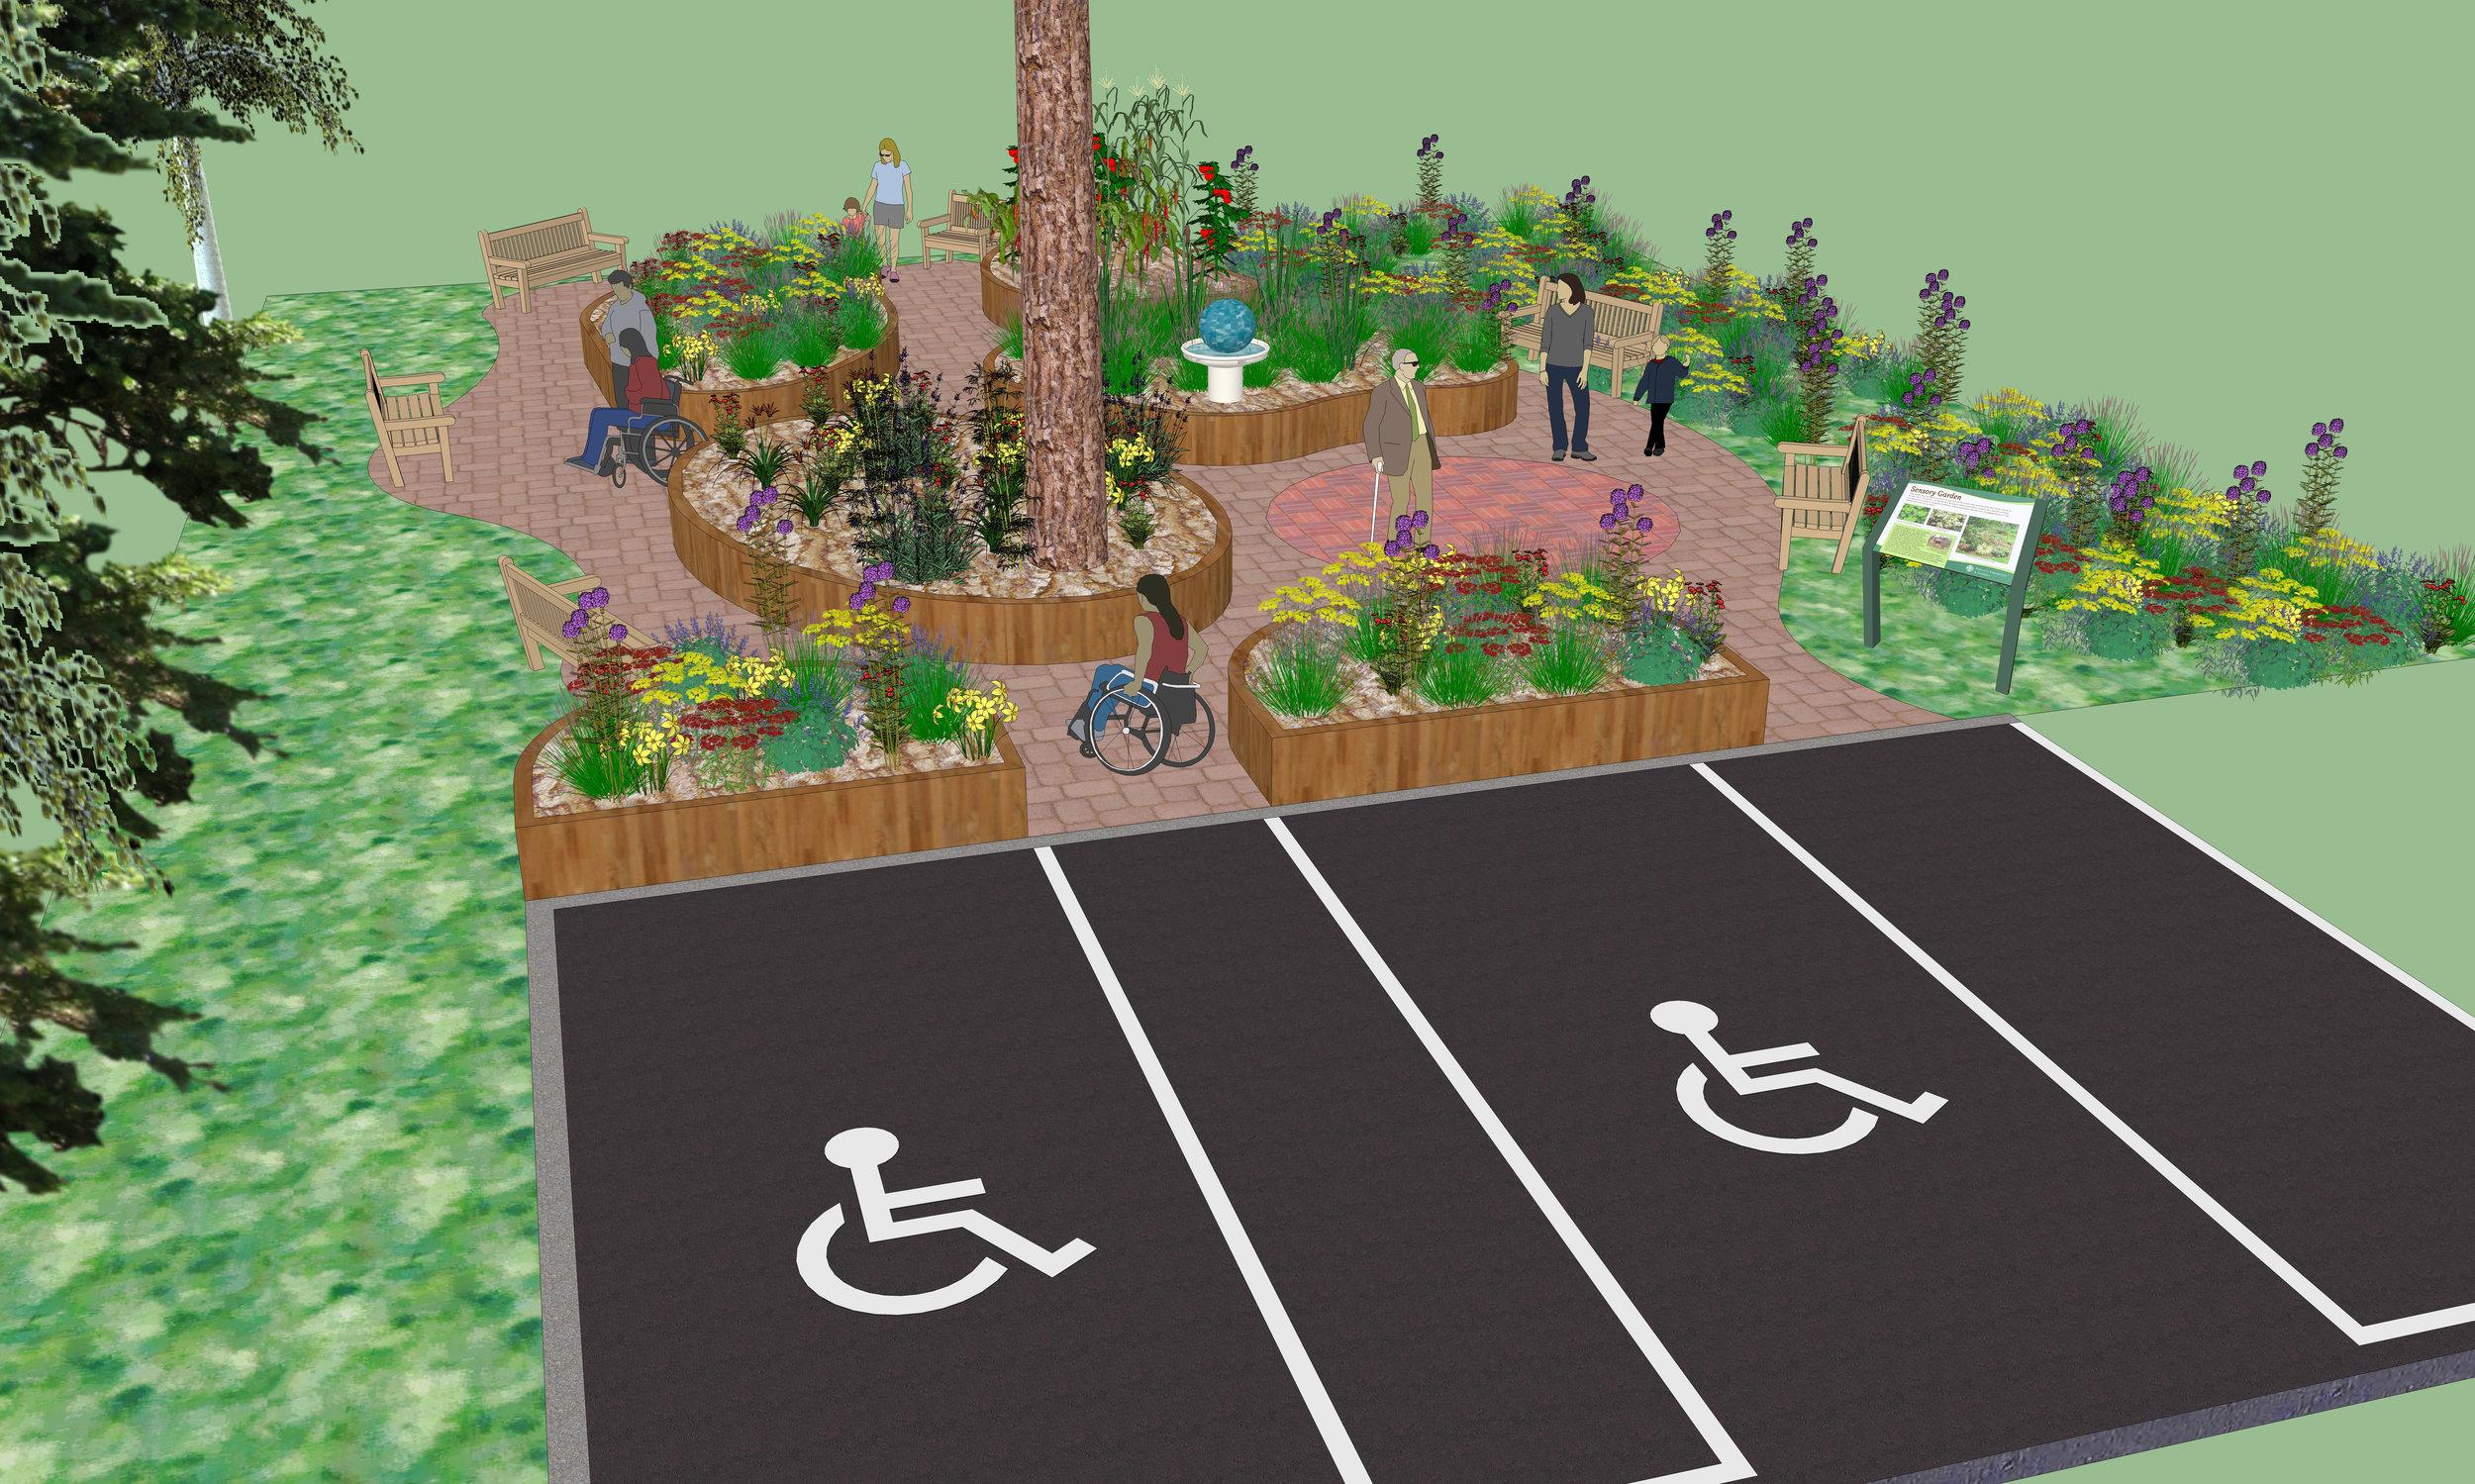 wheelchair access in sensory garden.jpeg